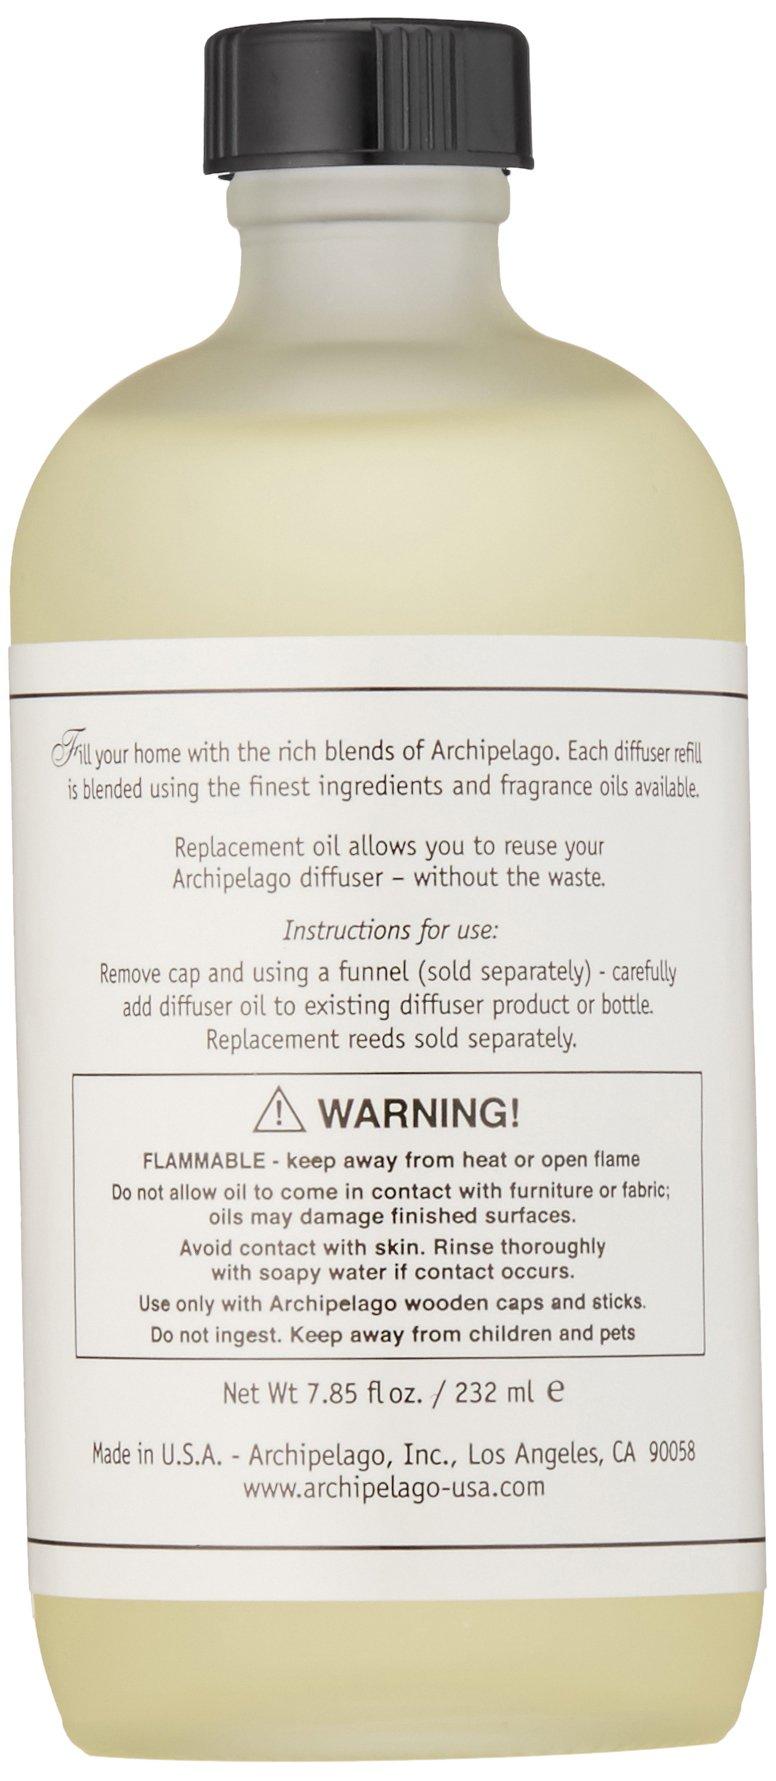 Archipelago Havana Diffuser Oil Refill,7.85 Fl Oz by Archipelago Botanicals (Image #2)